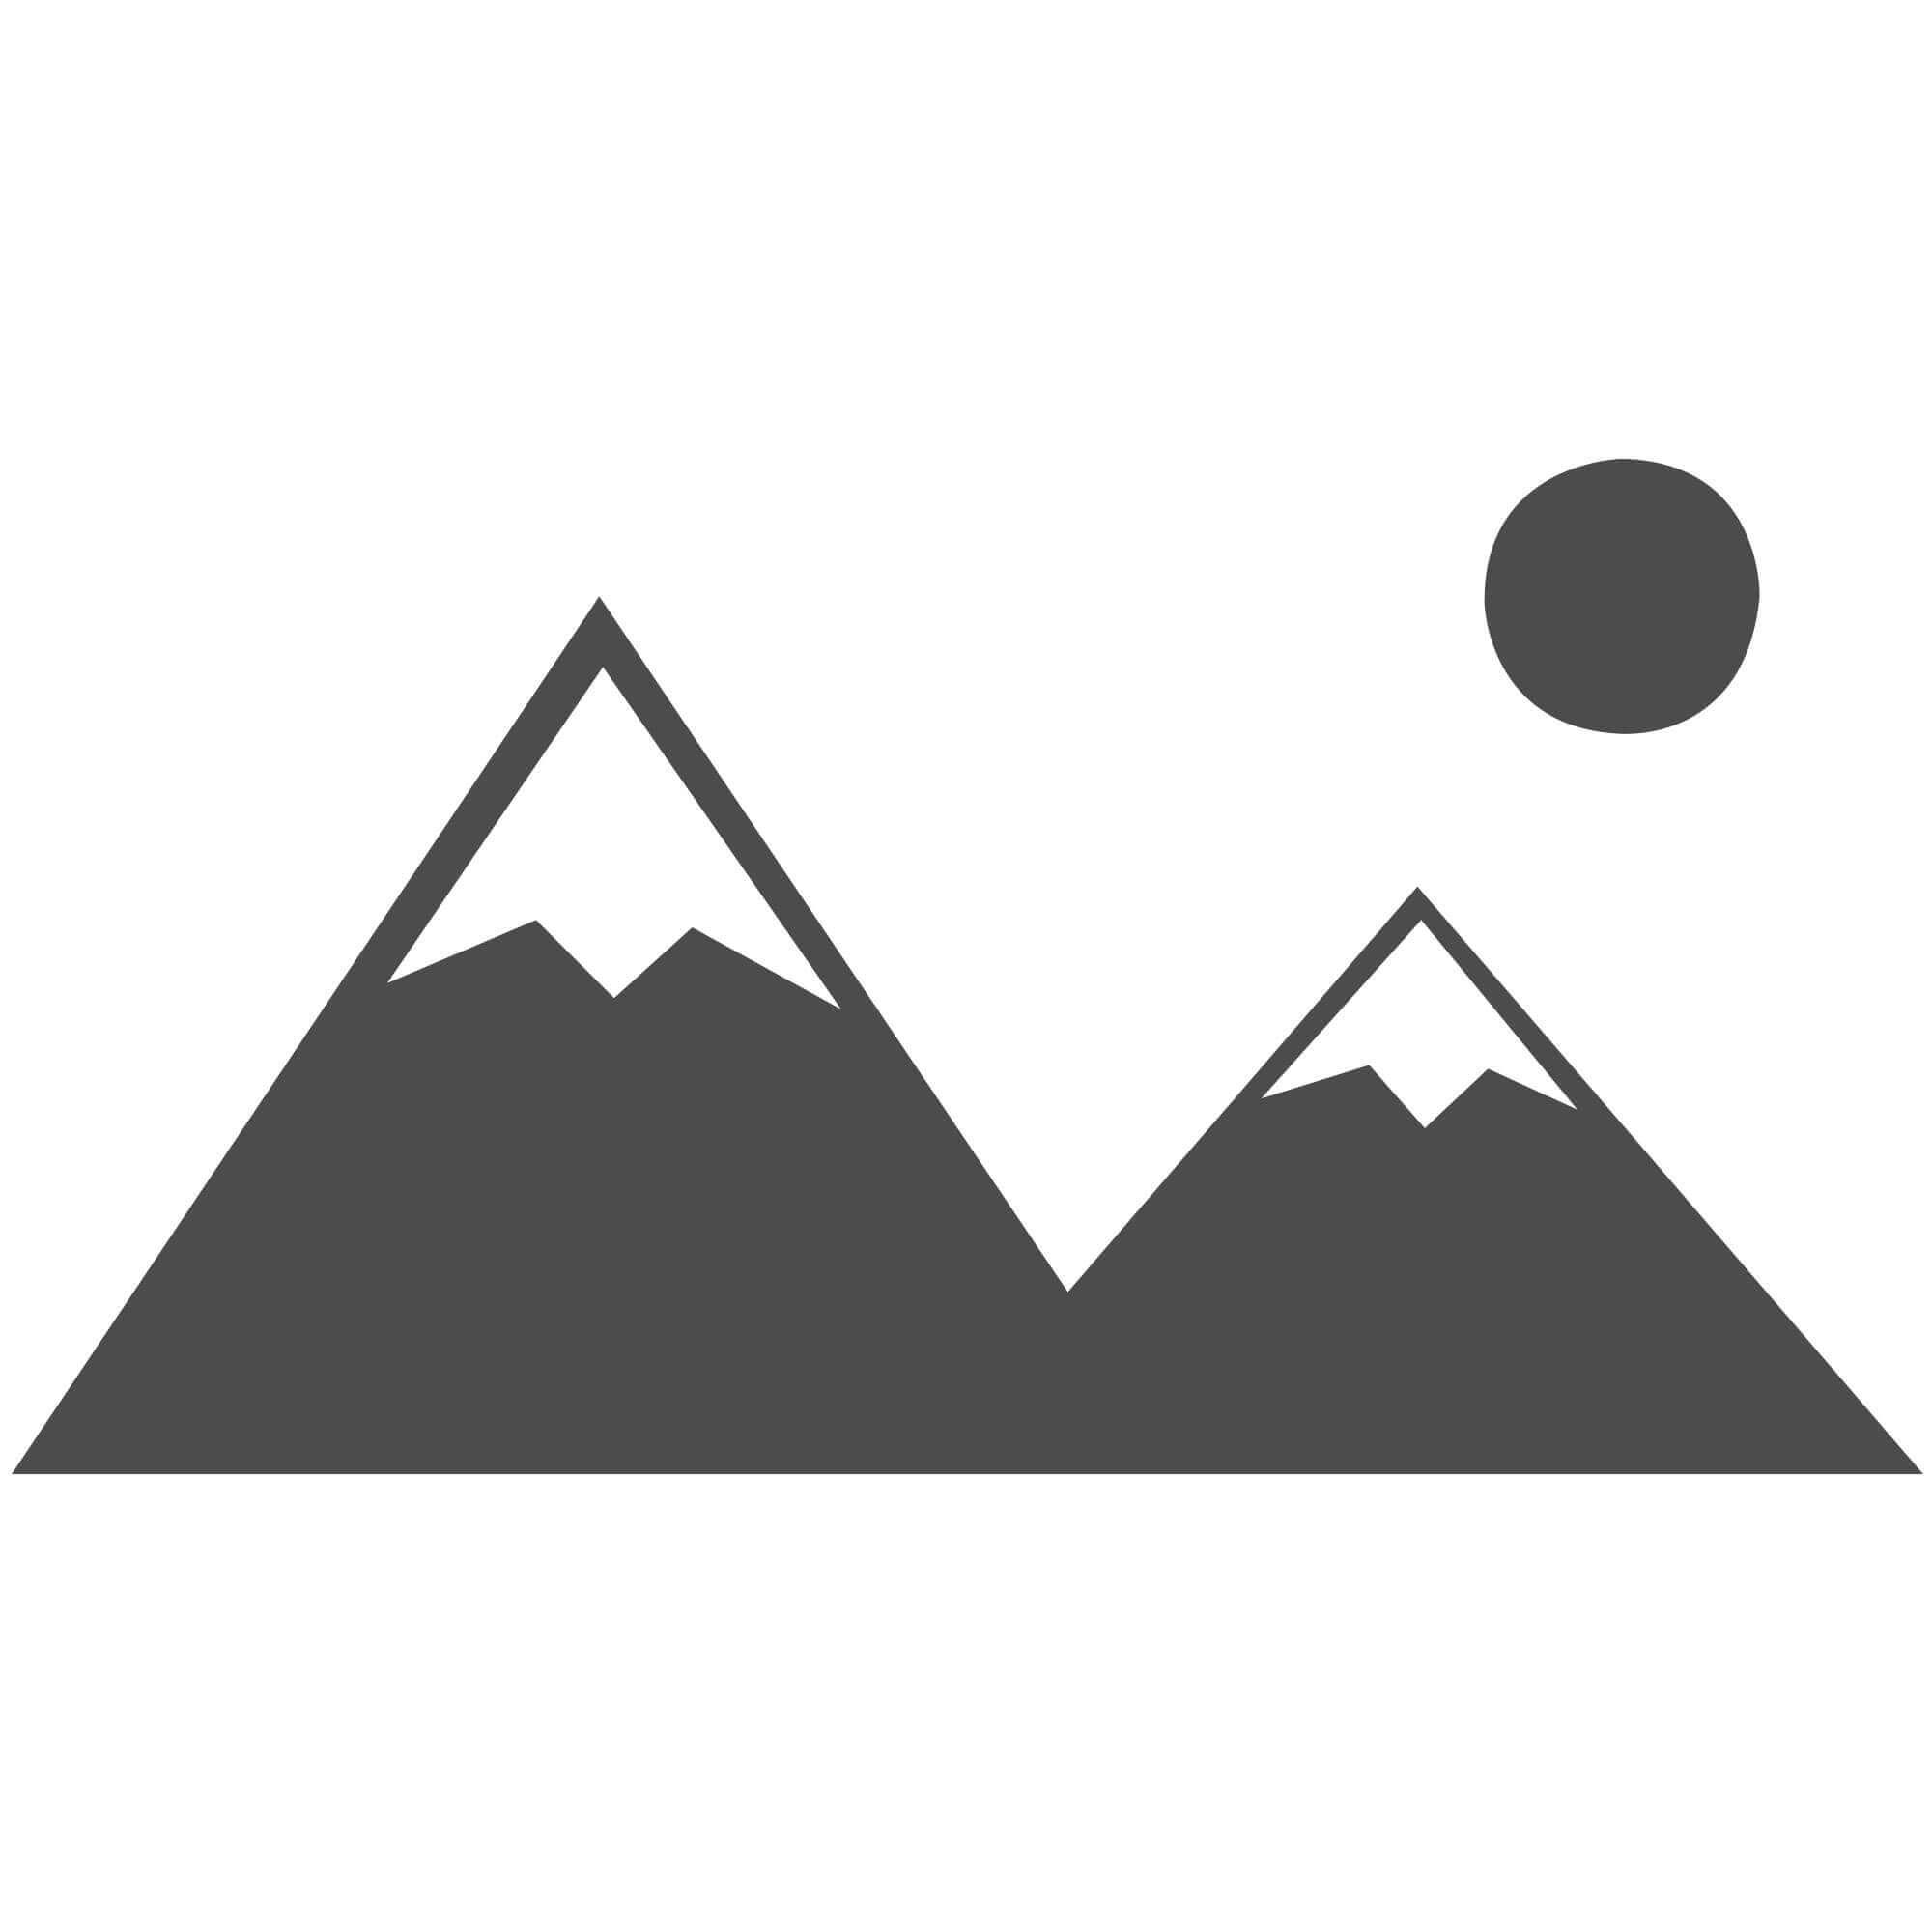 "Gabbeh Persian Style Stripe Rug - 933 R-200 x 285 cm (6'7"" x 9'4"")"